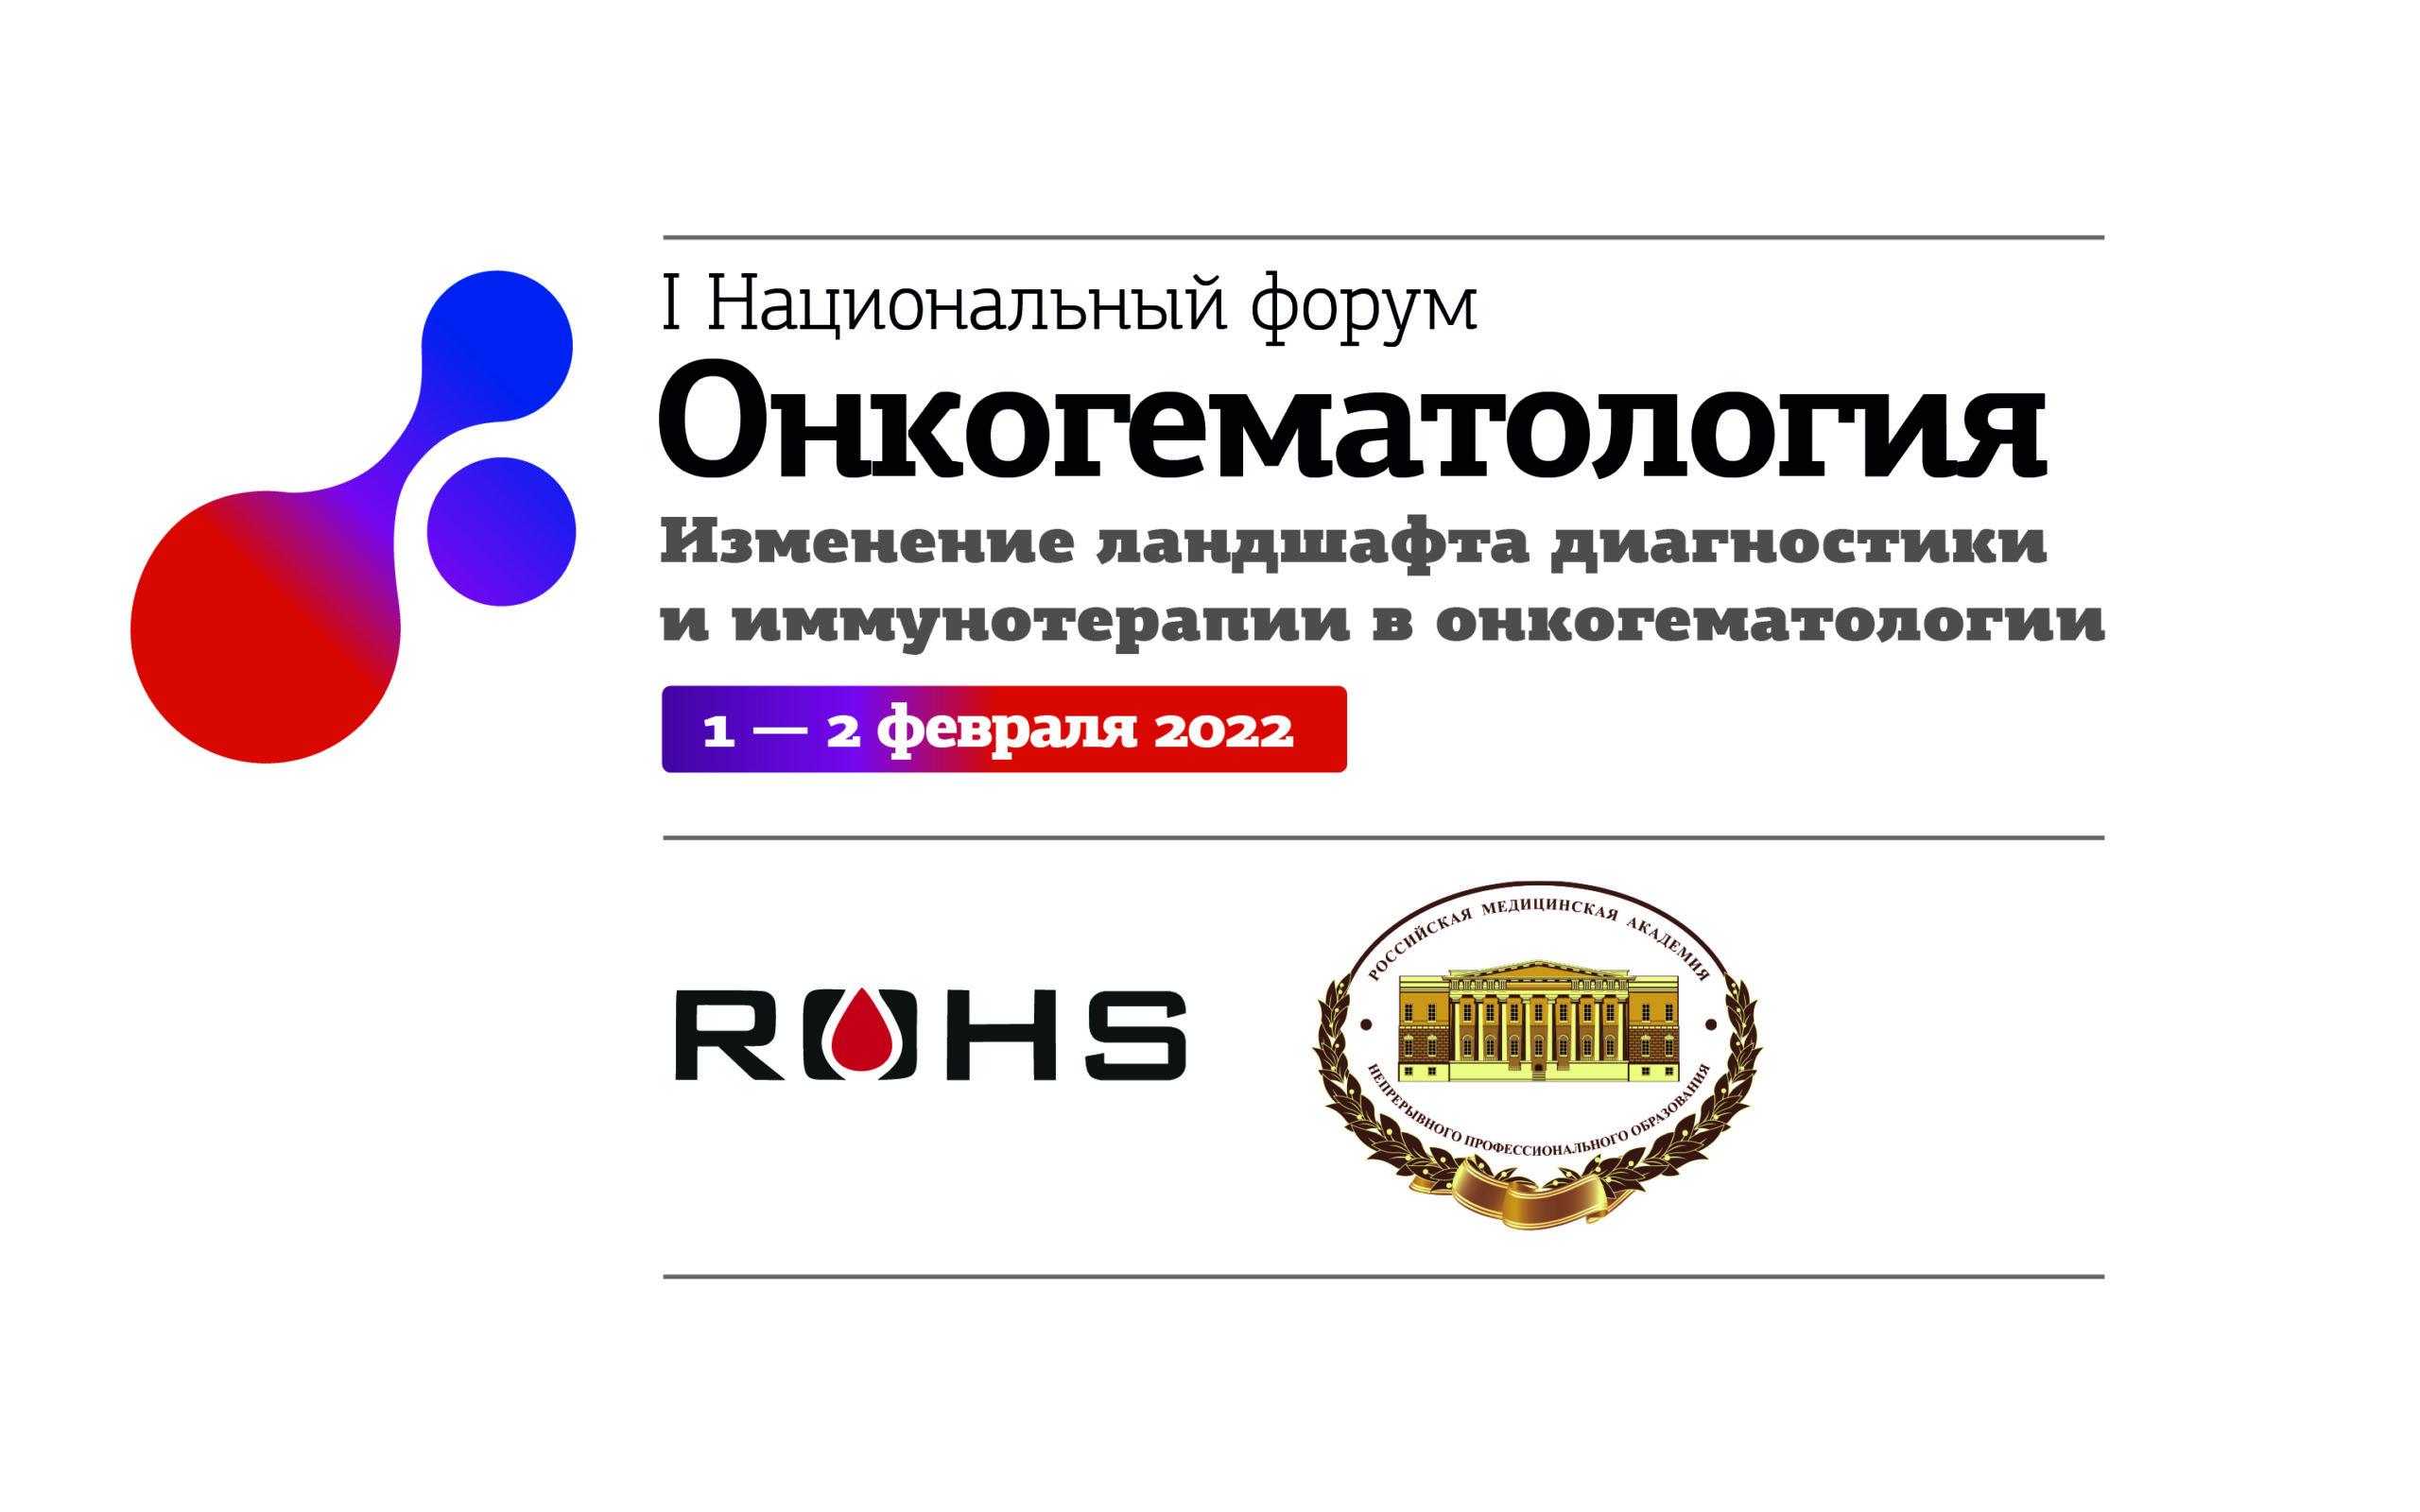 https://rusoncohem.ru/wp-content/uploads/2021/09/logo-scaled.jpg